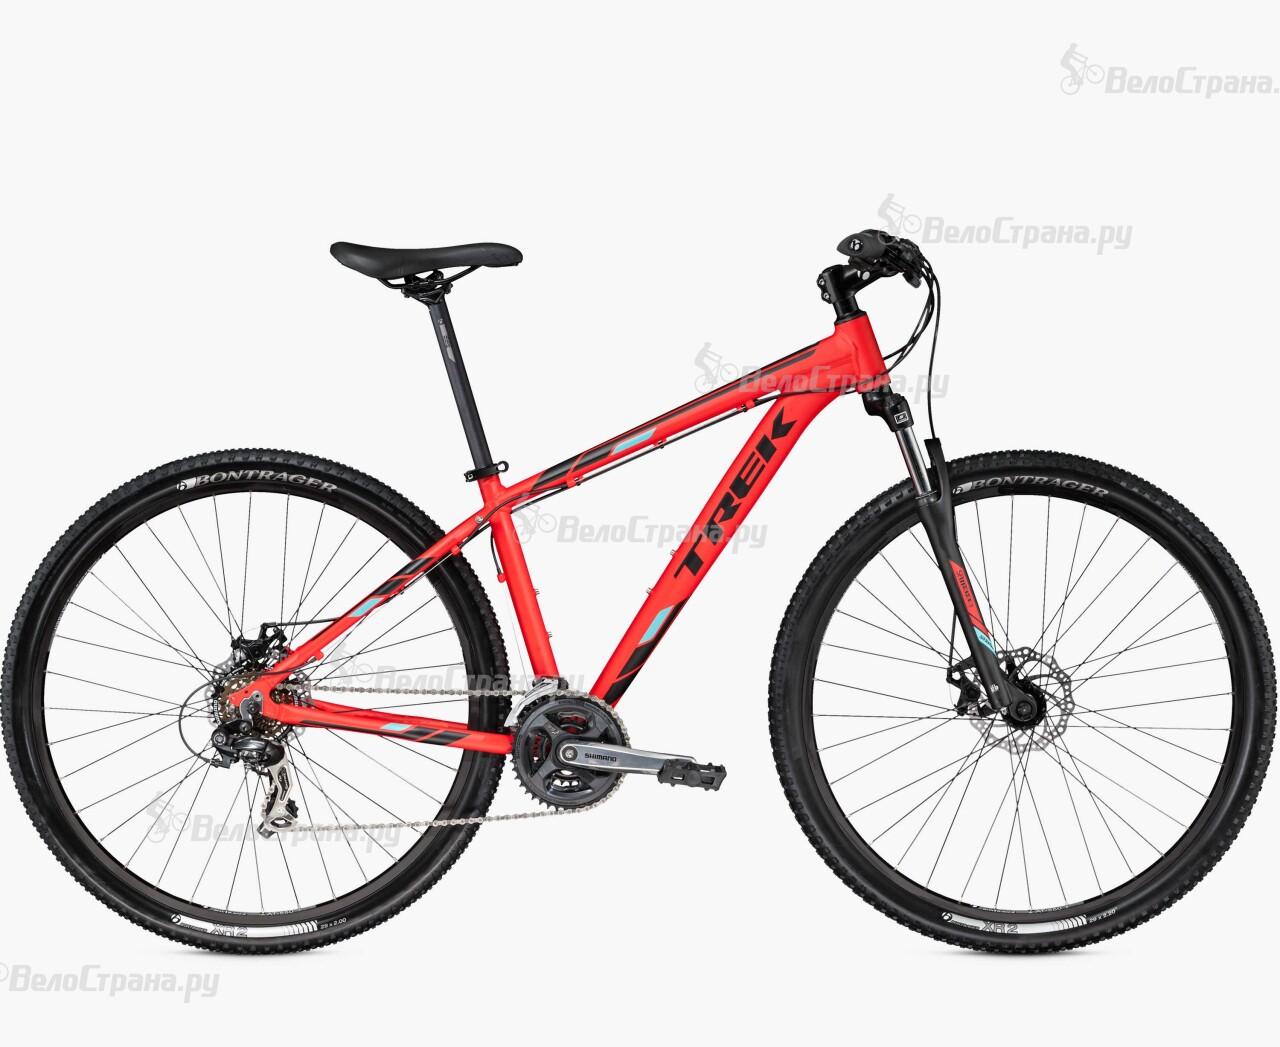 Велосипед Trek Marlin 5 27.5 (2016) велосипед trek marlin 5 29 2016